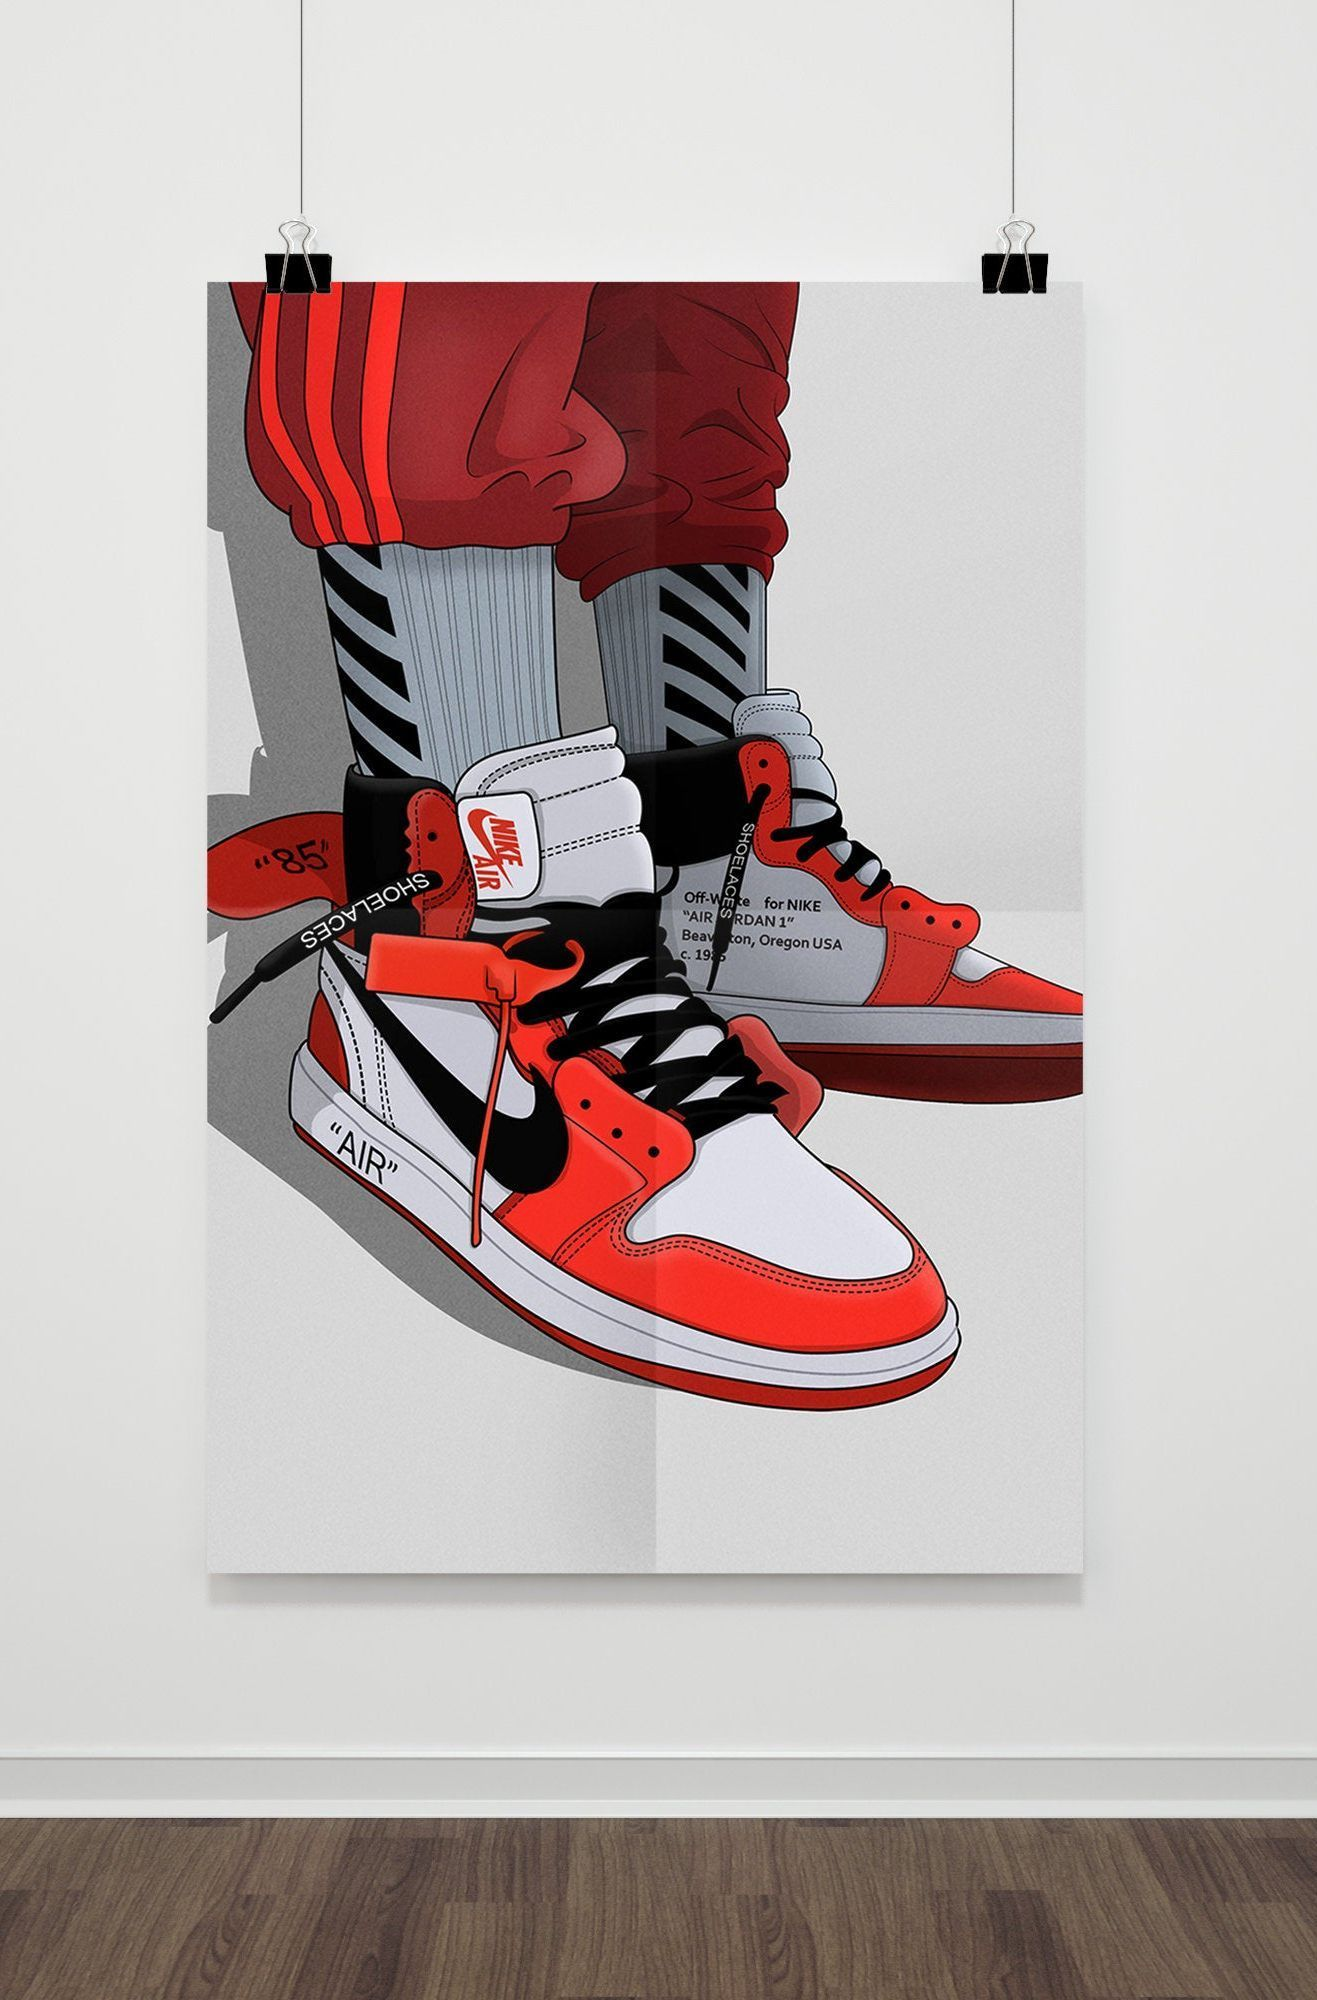 Nike Sneaker Poster Set Nike Shoes Nike Poster Nike Etsy Sneaker Posters Shoes Wallpaper Nike Poster